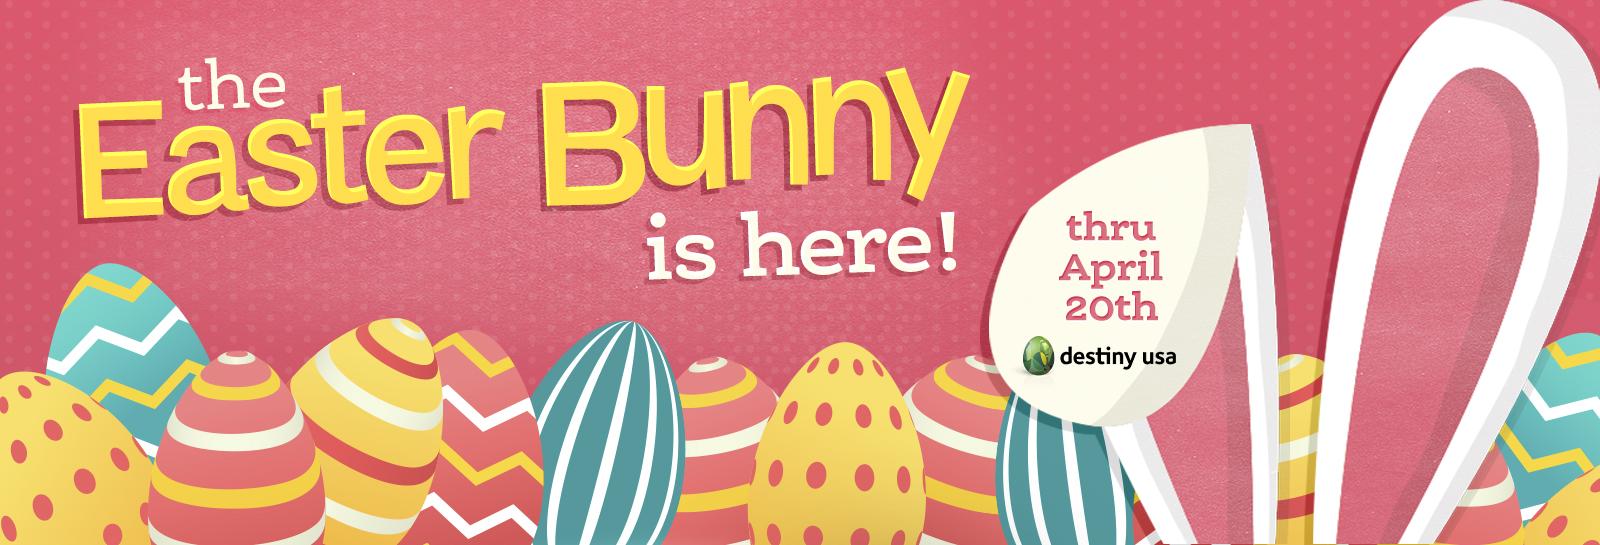 2019 Easter Bunny Arrival Homepage Slider Here